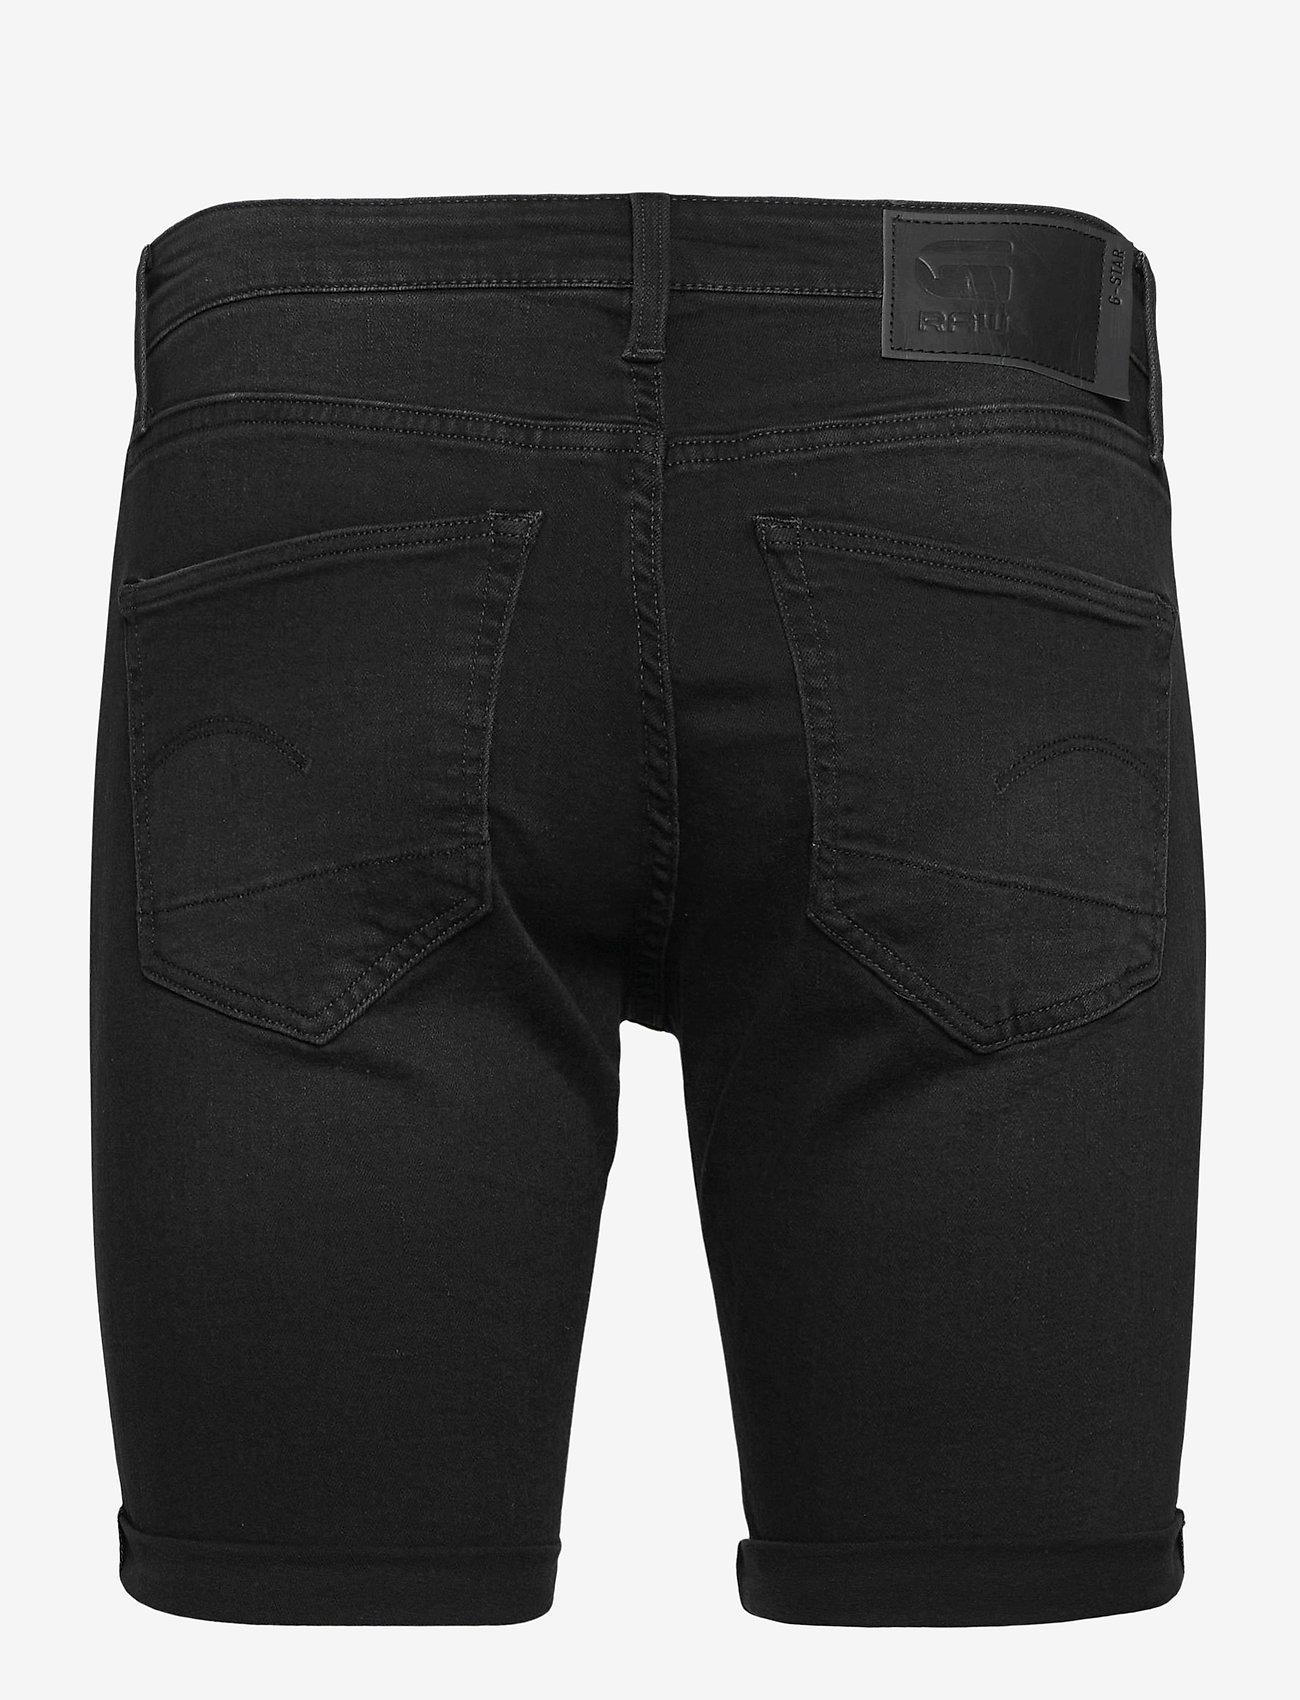 G-star RAW - 3301 Slim short - denim shorts - worn in meteor - 1